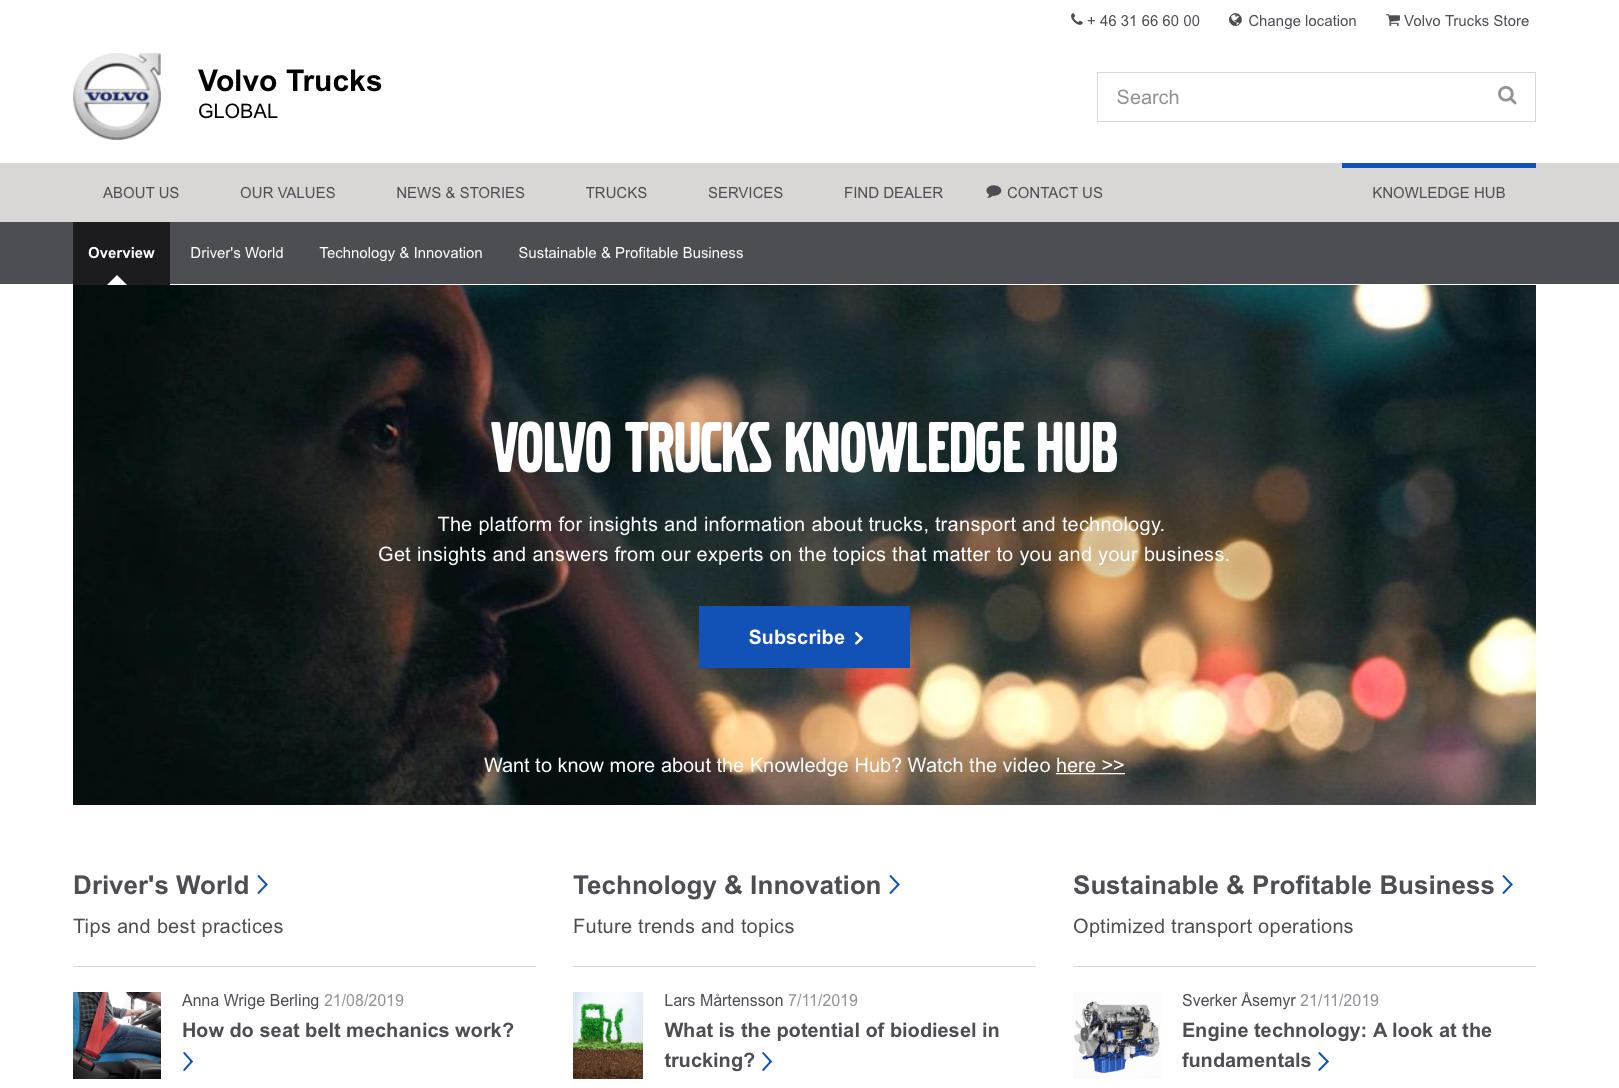 A screenshot of Volvo Trucks Knowledge Hub